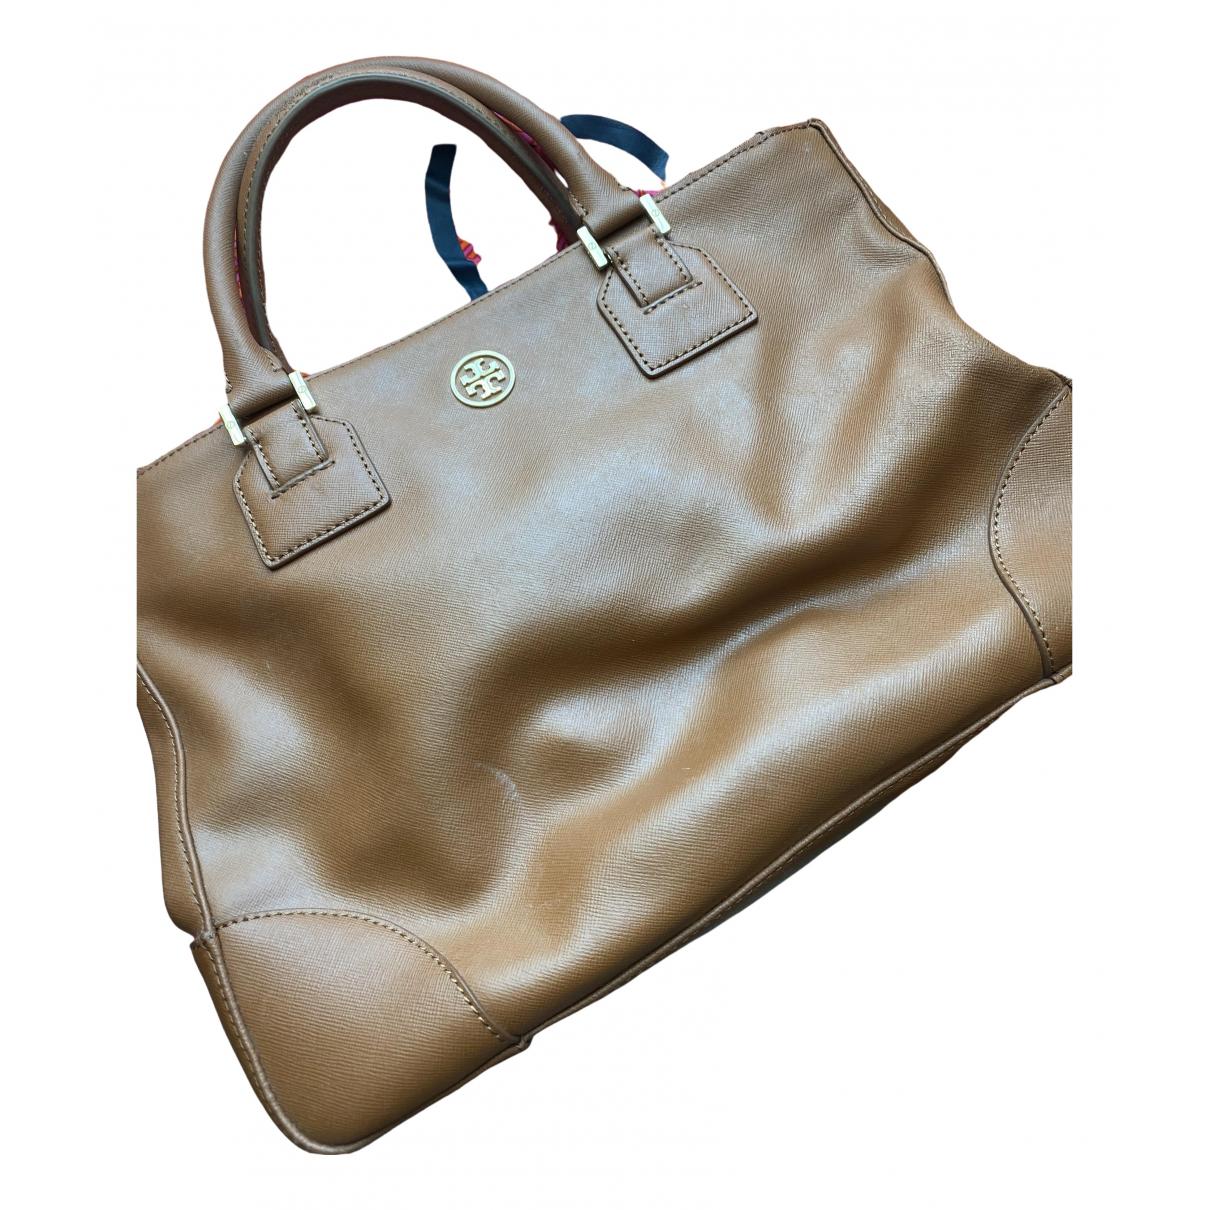 Tory Burch \N Brown Leather handbag for Women \N